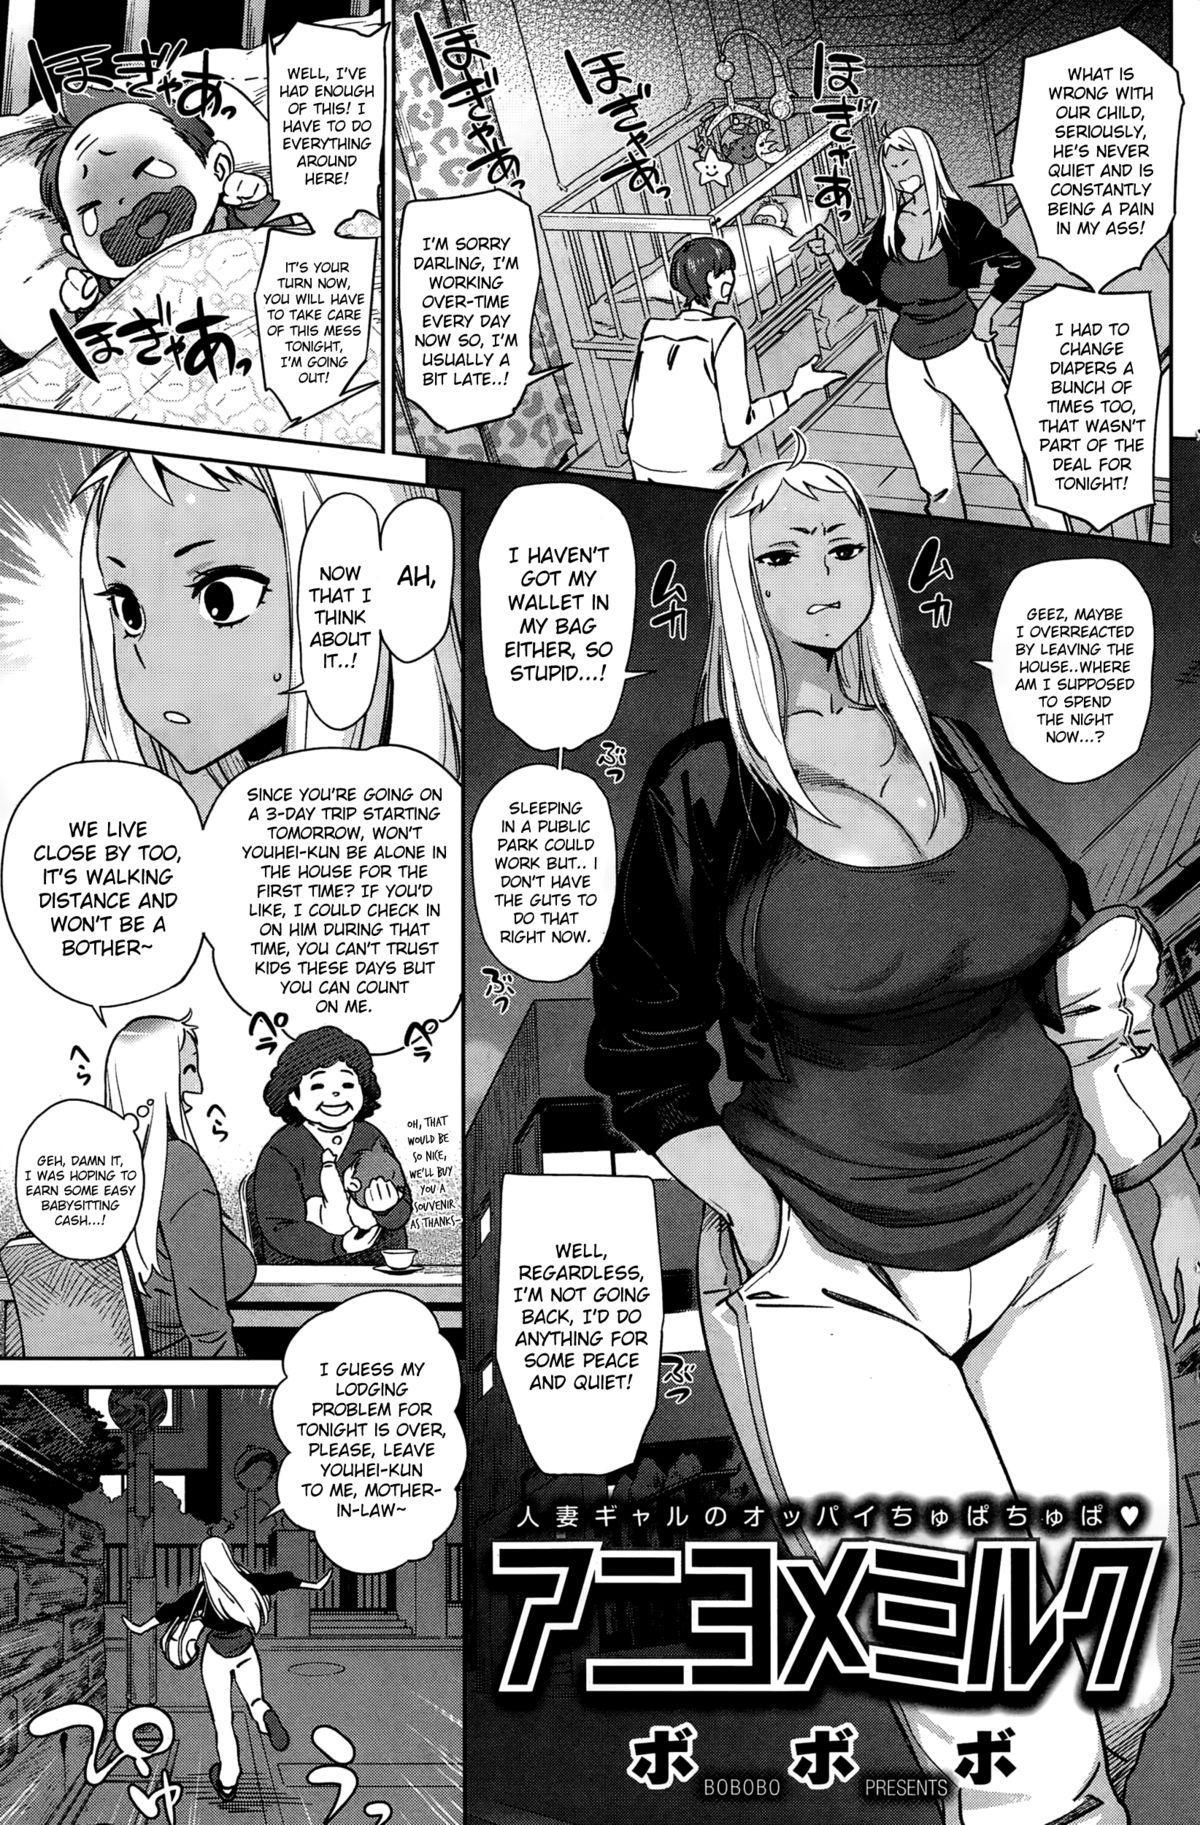 [Bobobo] Aniyome Milk | Elder Sister-in-Law's Milk! (COMIC Shitsurakuten 2014-12) [English] [Steven_Even] 0